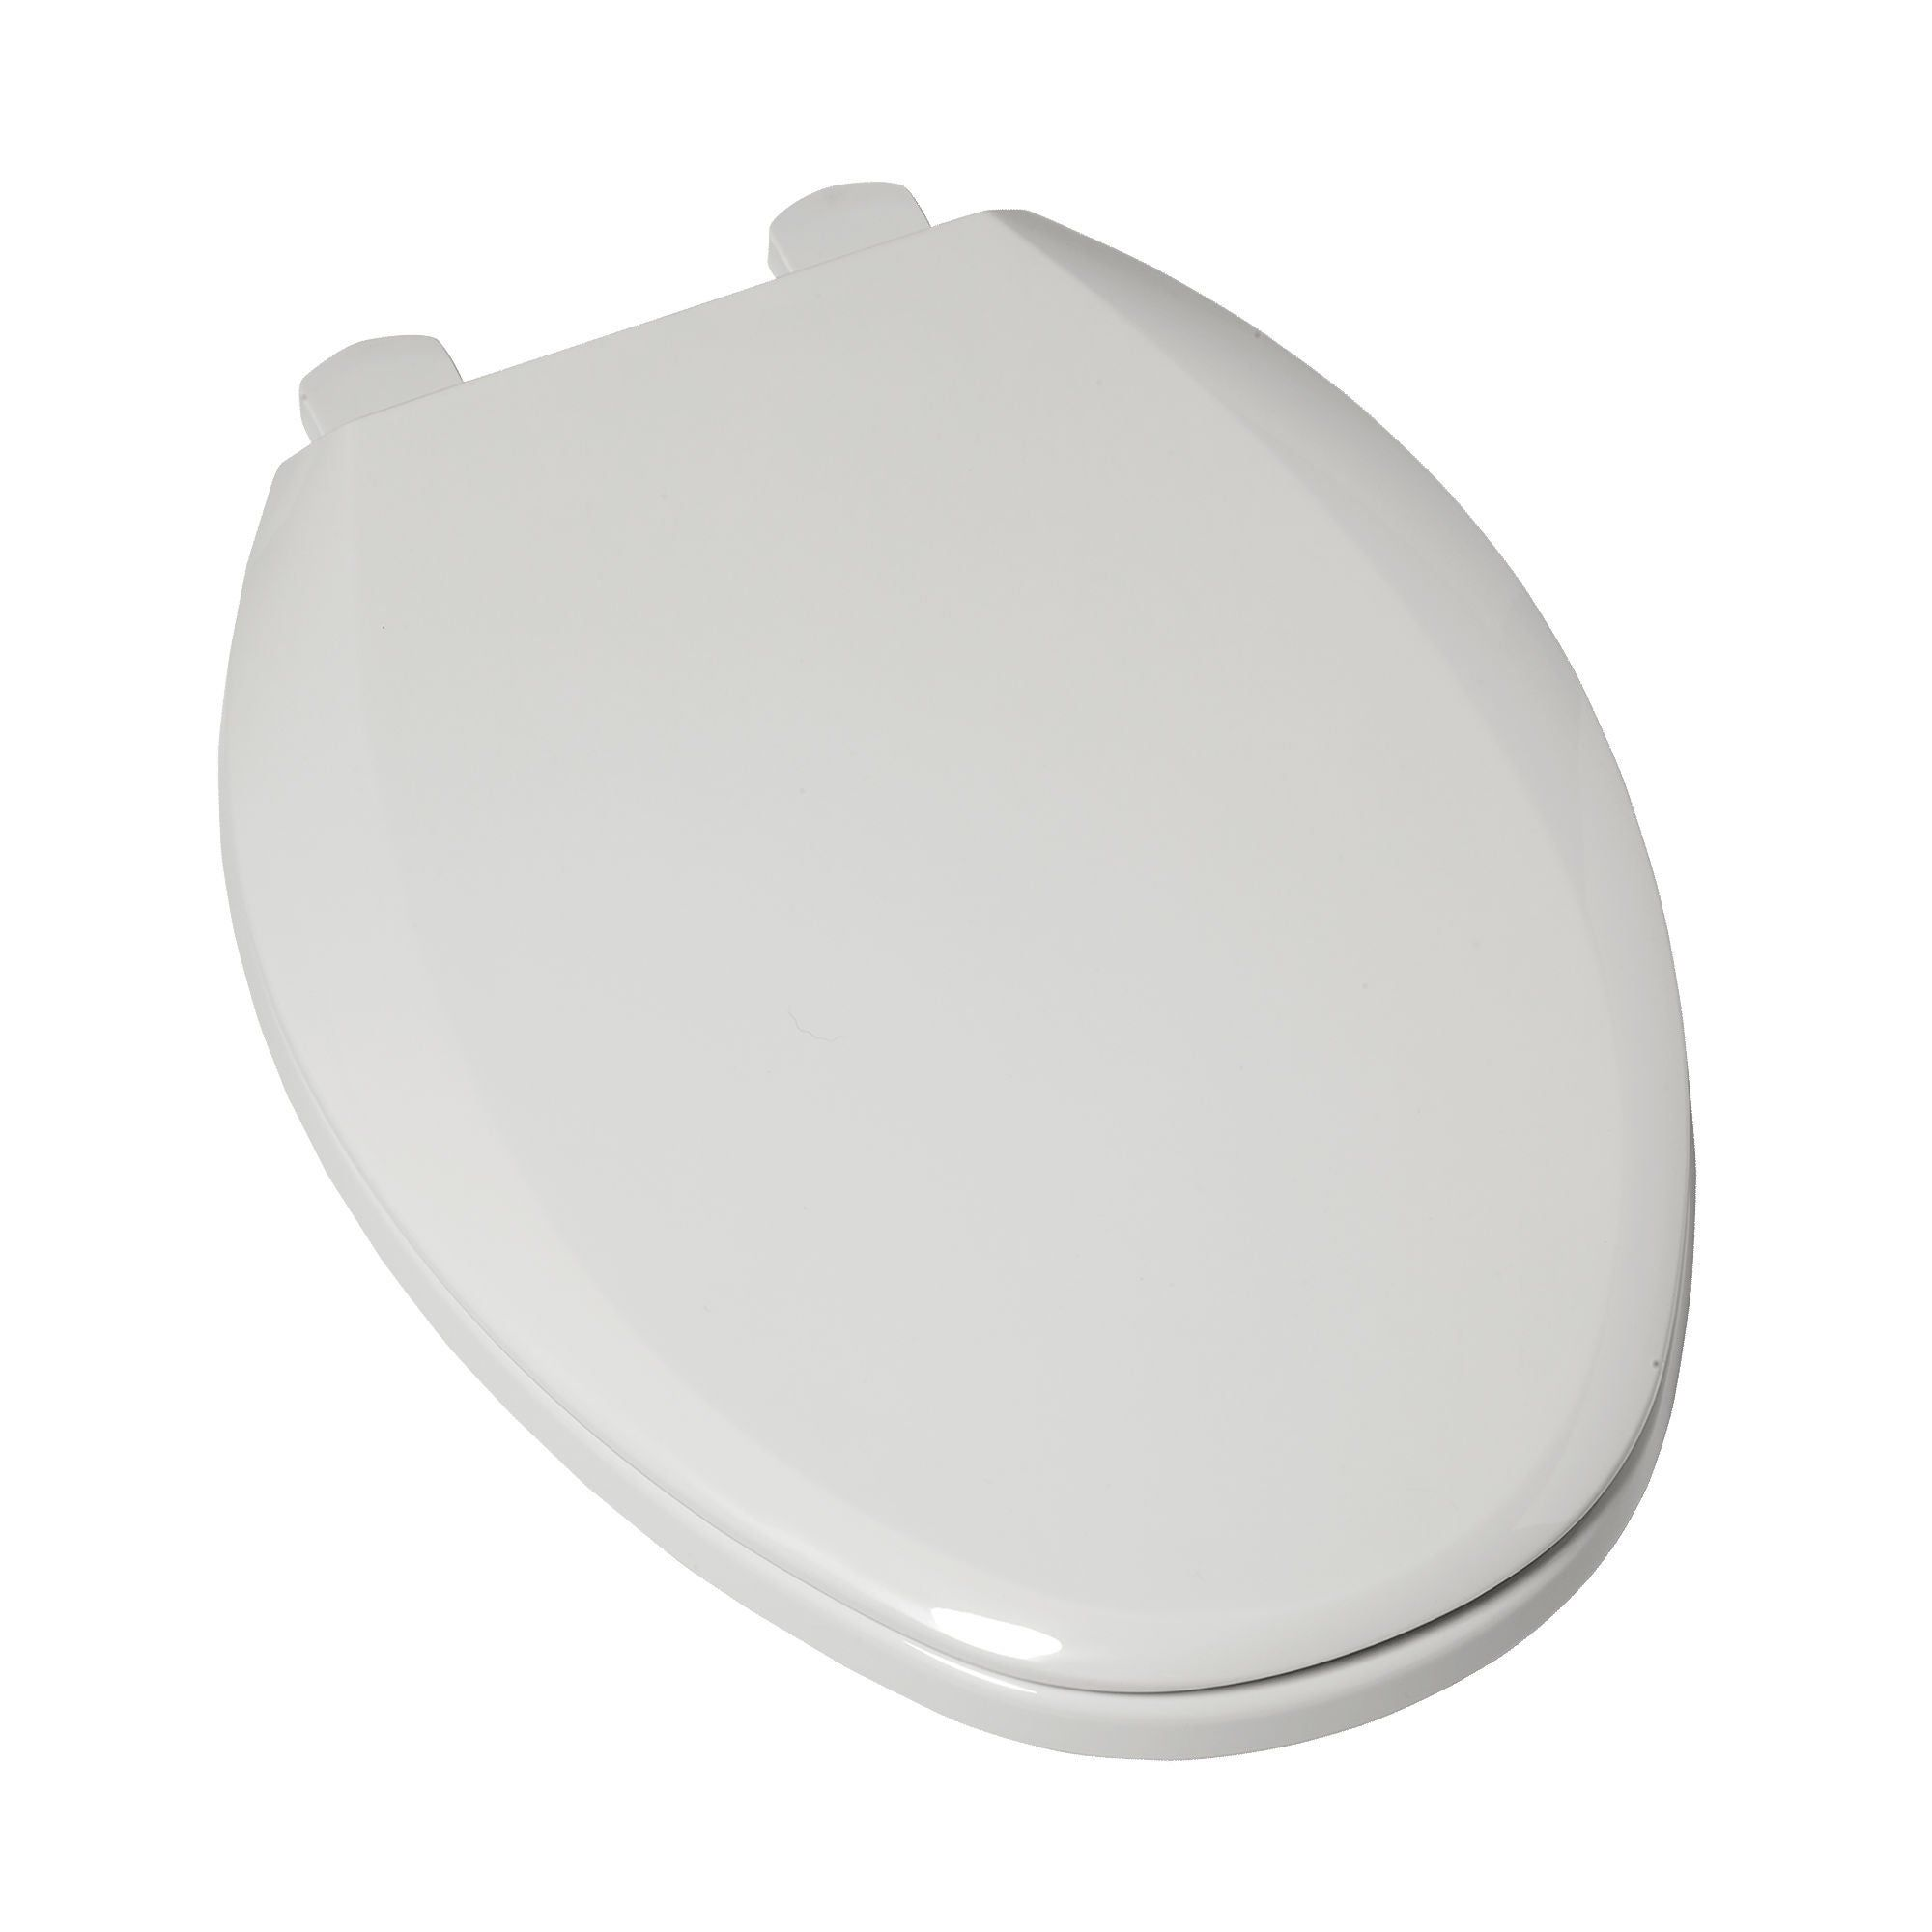 American Standard Plastic Elongated Toilet Seat 5257a 65d 020